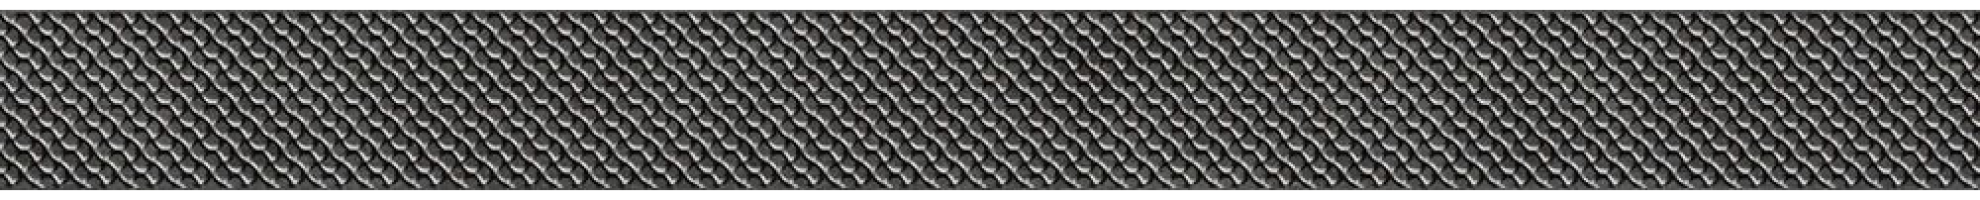 Бордюр Alma Ceramica Rane 74x6.7 BWU12RAN07R